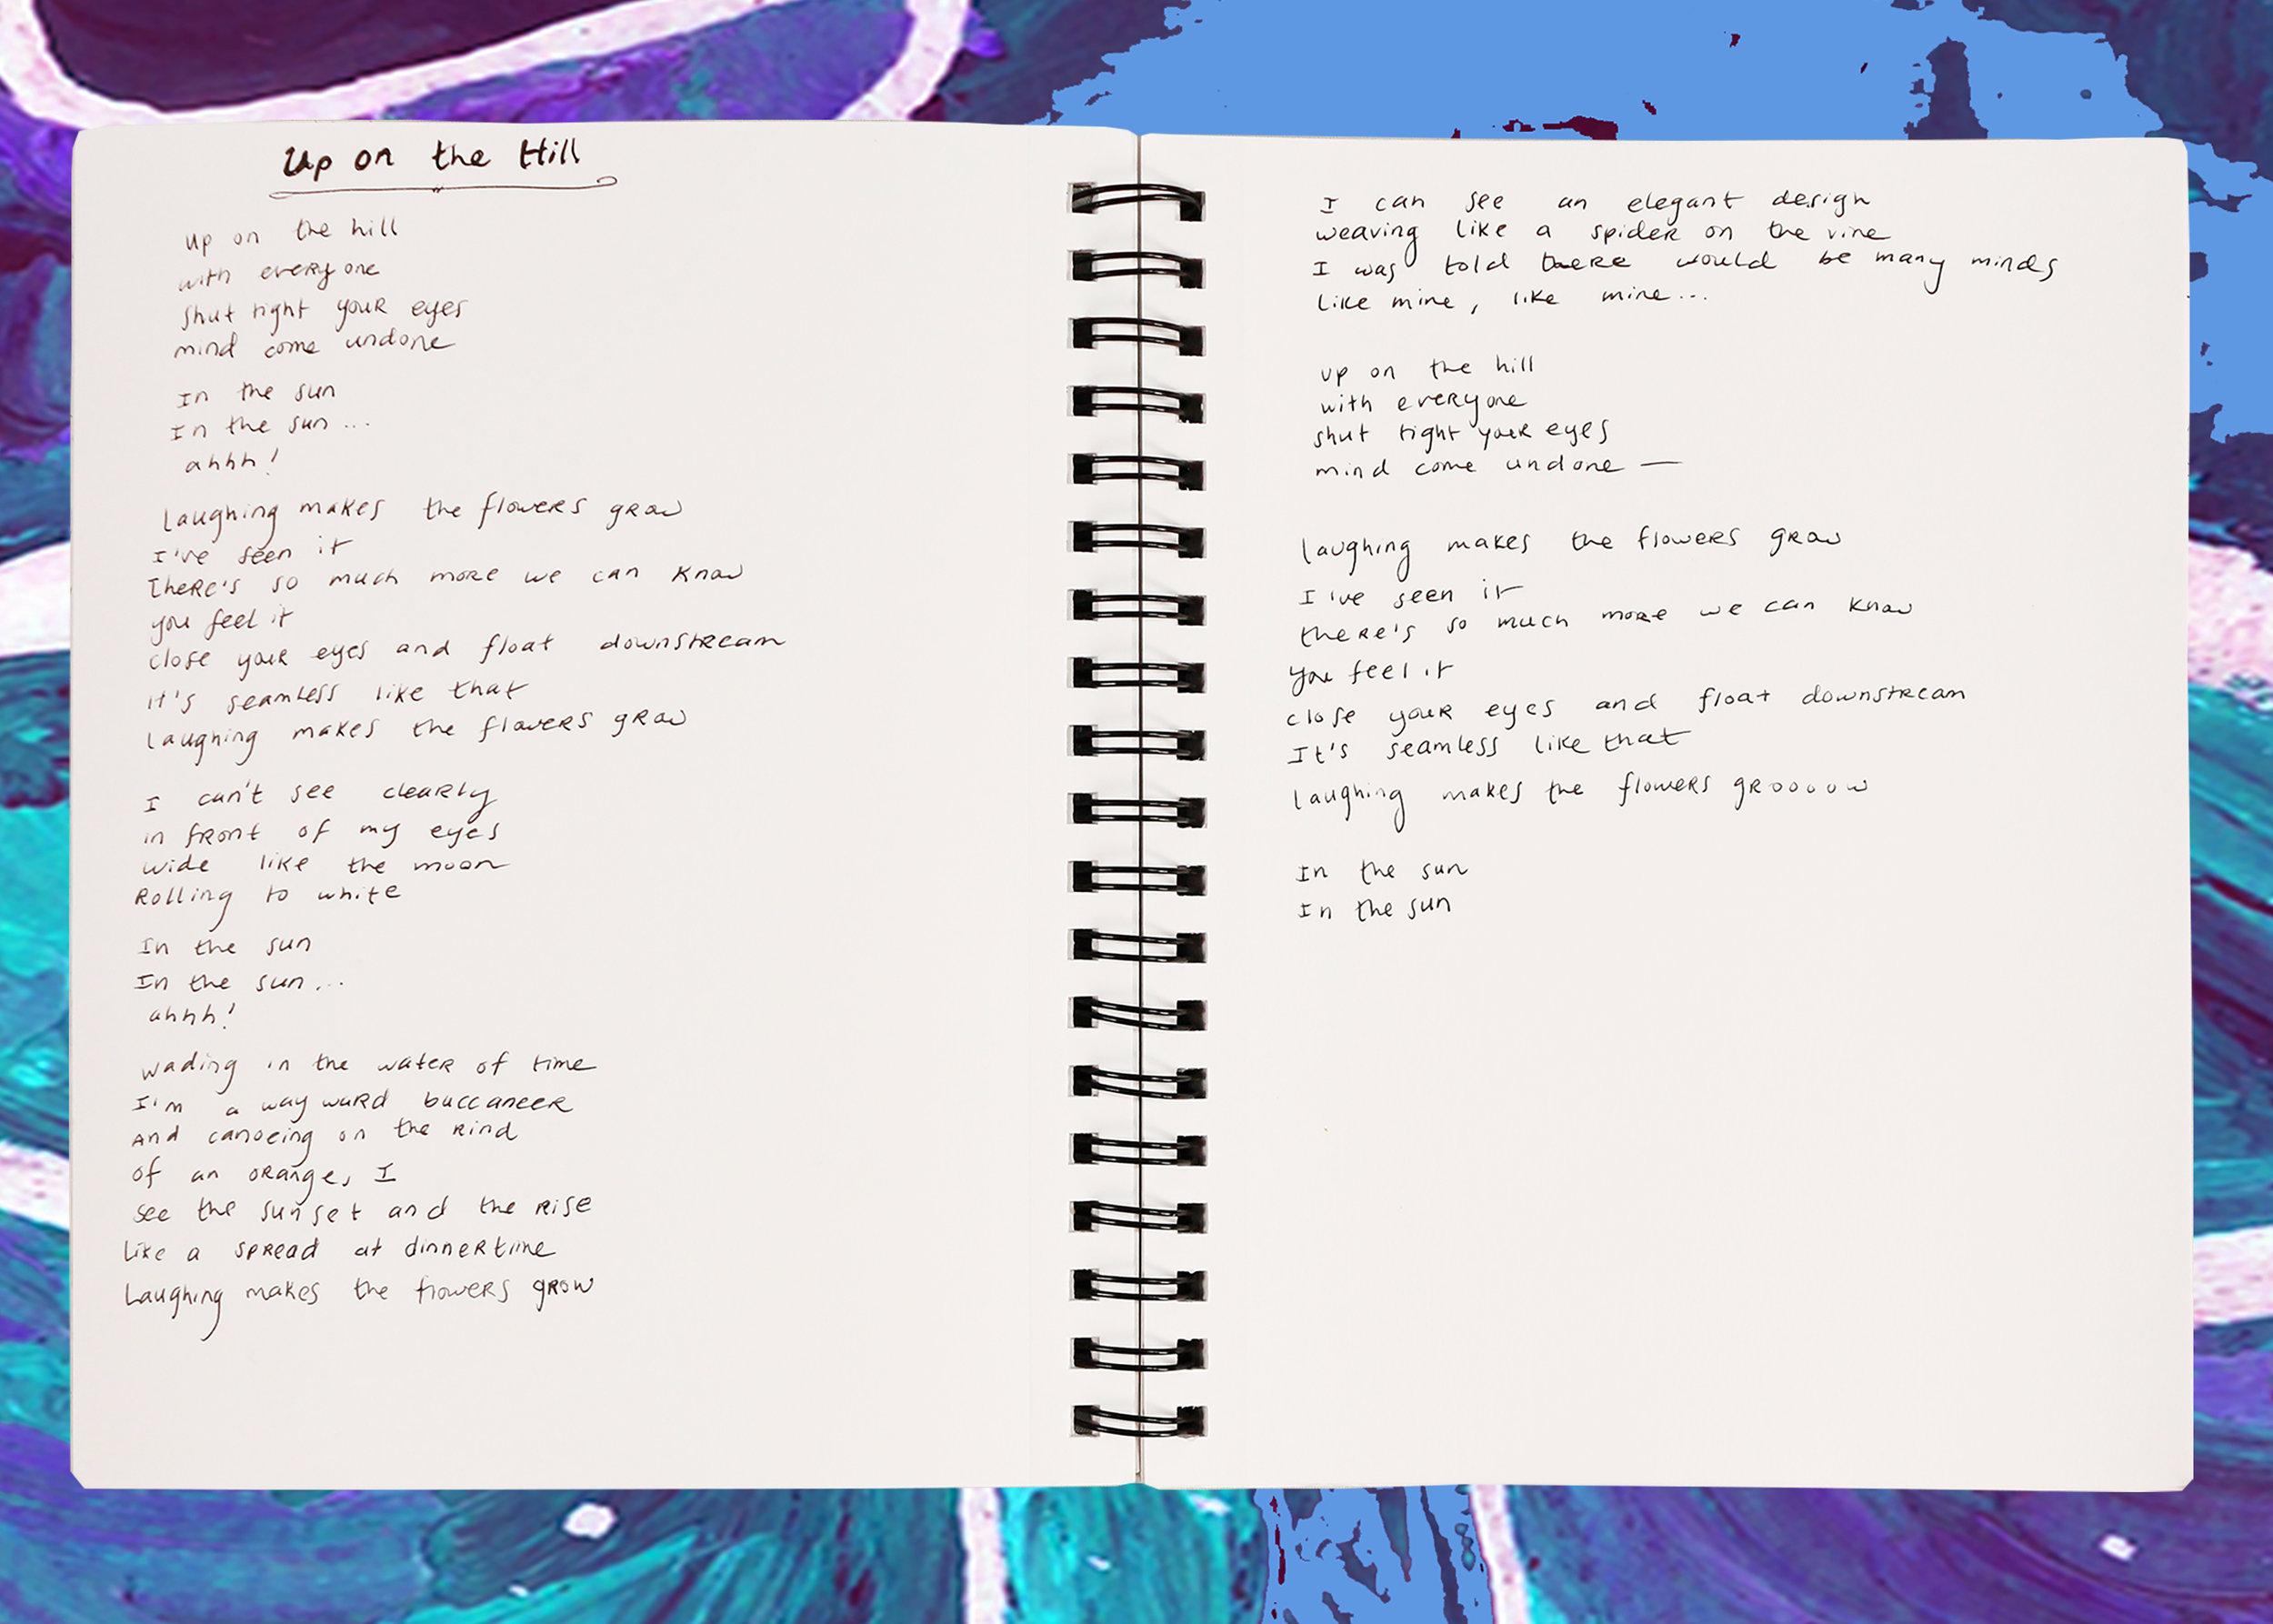 Up on the Hill Lyrics bigger.jpg